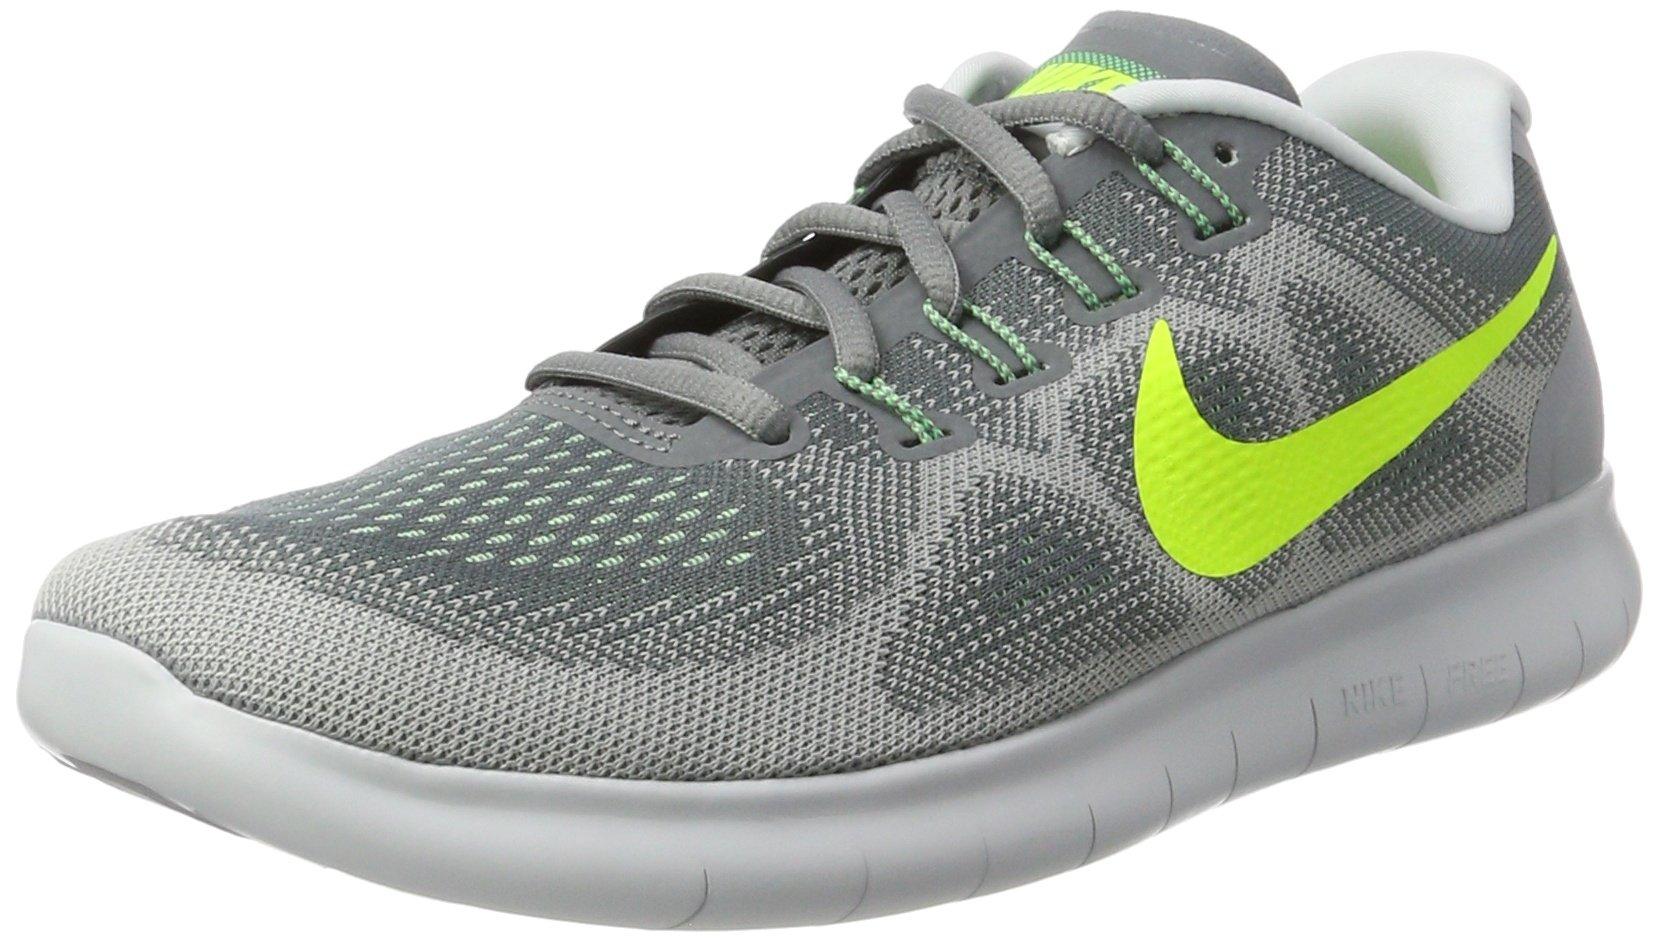 69f293d536c Galleon - Nike Men s Free RN 2017 Running Shoes (11.5